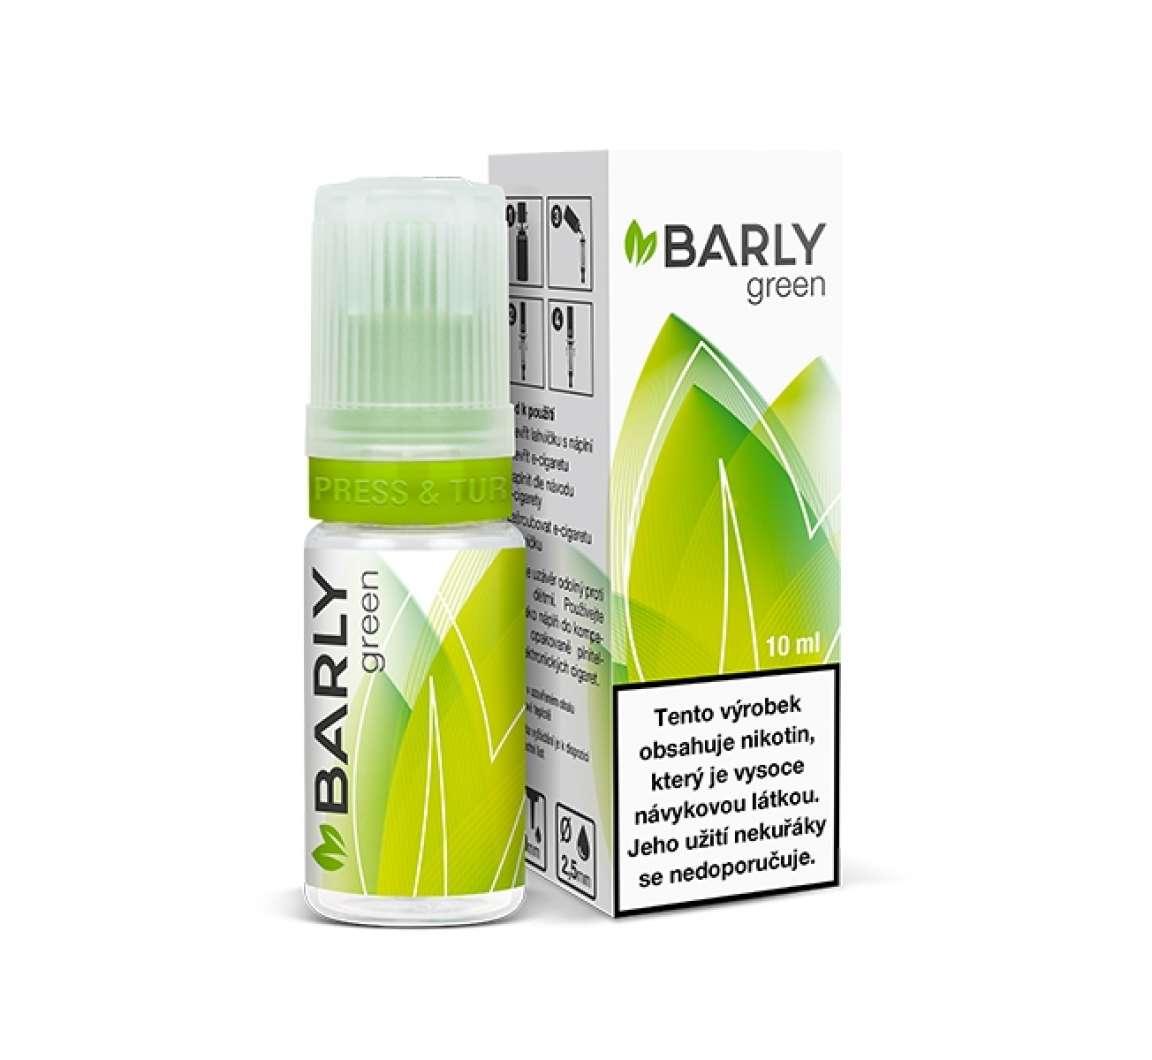 Barly GREEN 10ml 15mg